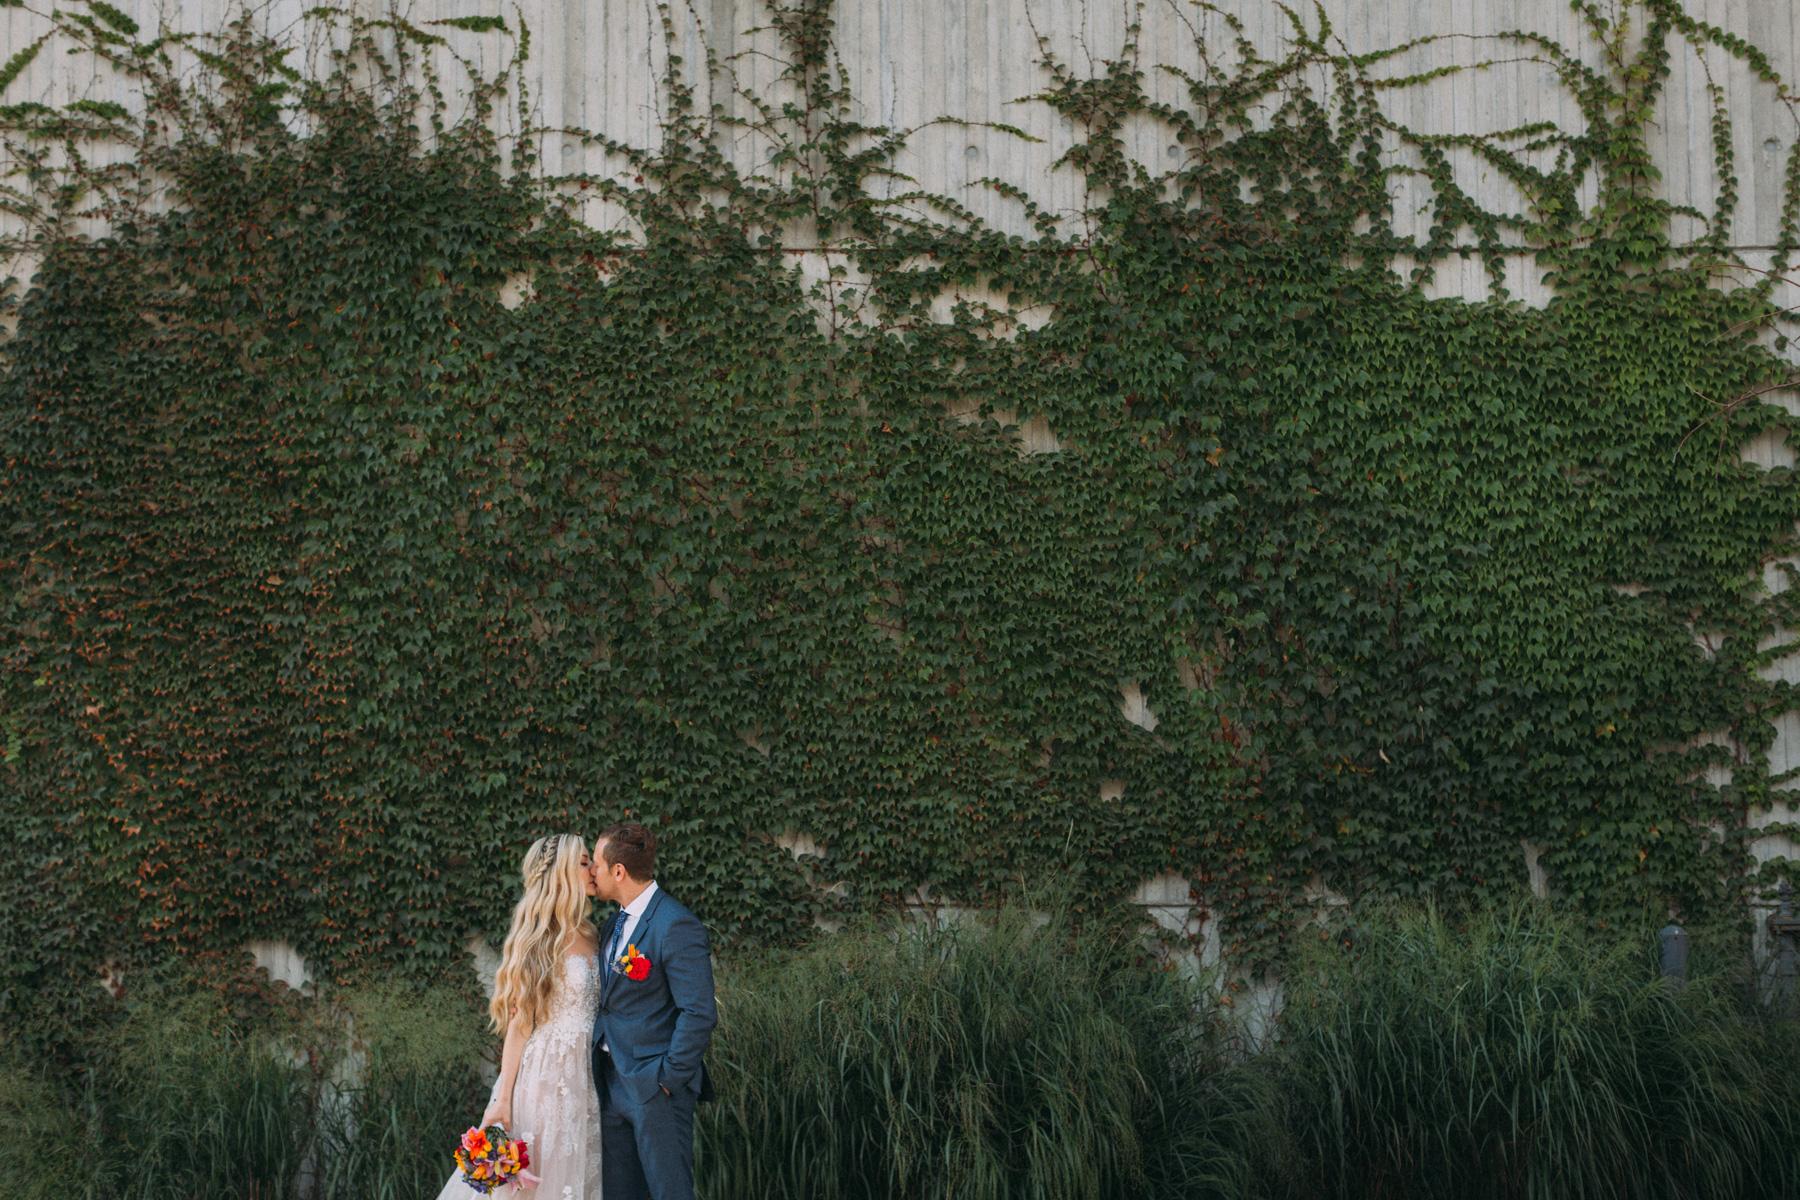 La-Maquette-wedding-by-Toronto-modern-wedding-photographer-Sam-Wong_20.jpg